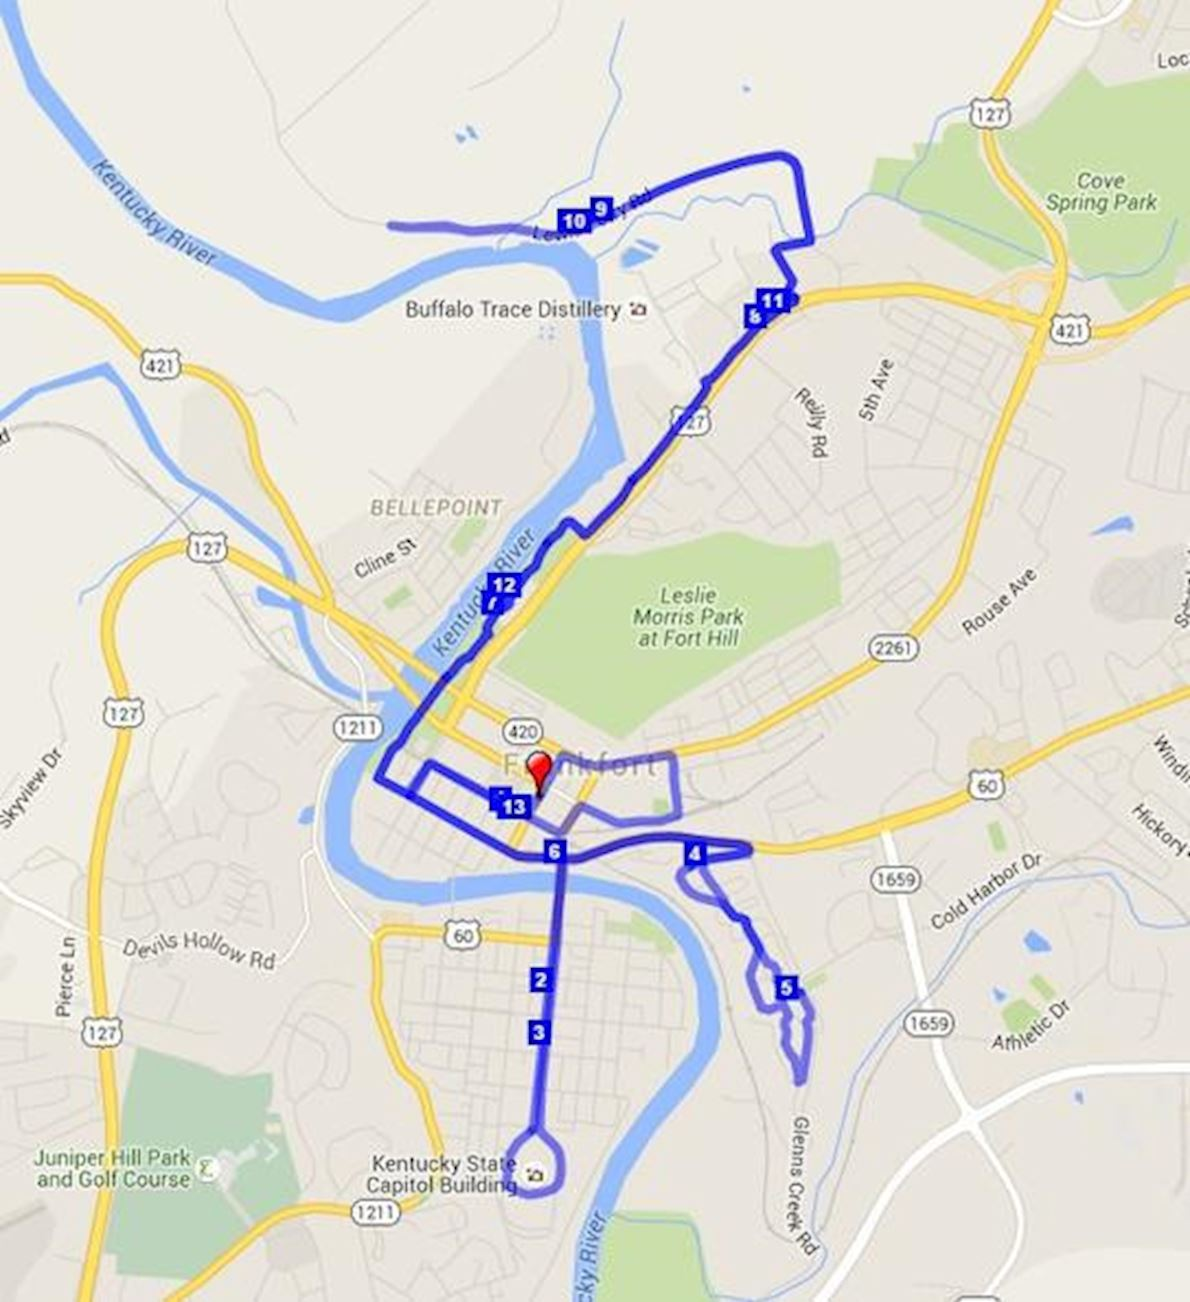 KY History Half Marathon, 10K, 5K and 1 Mile Fun Run Route Map